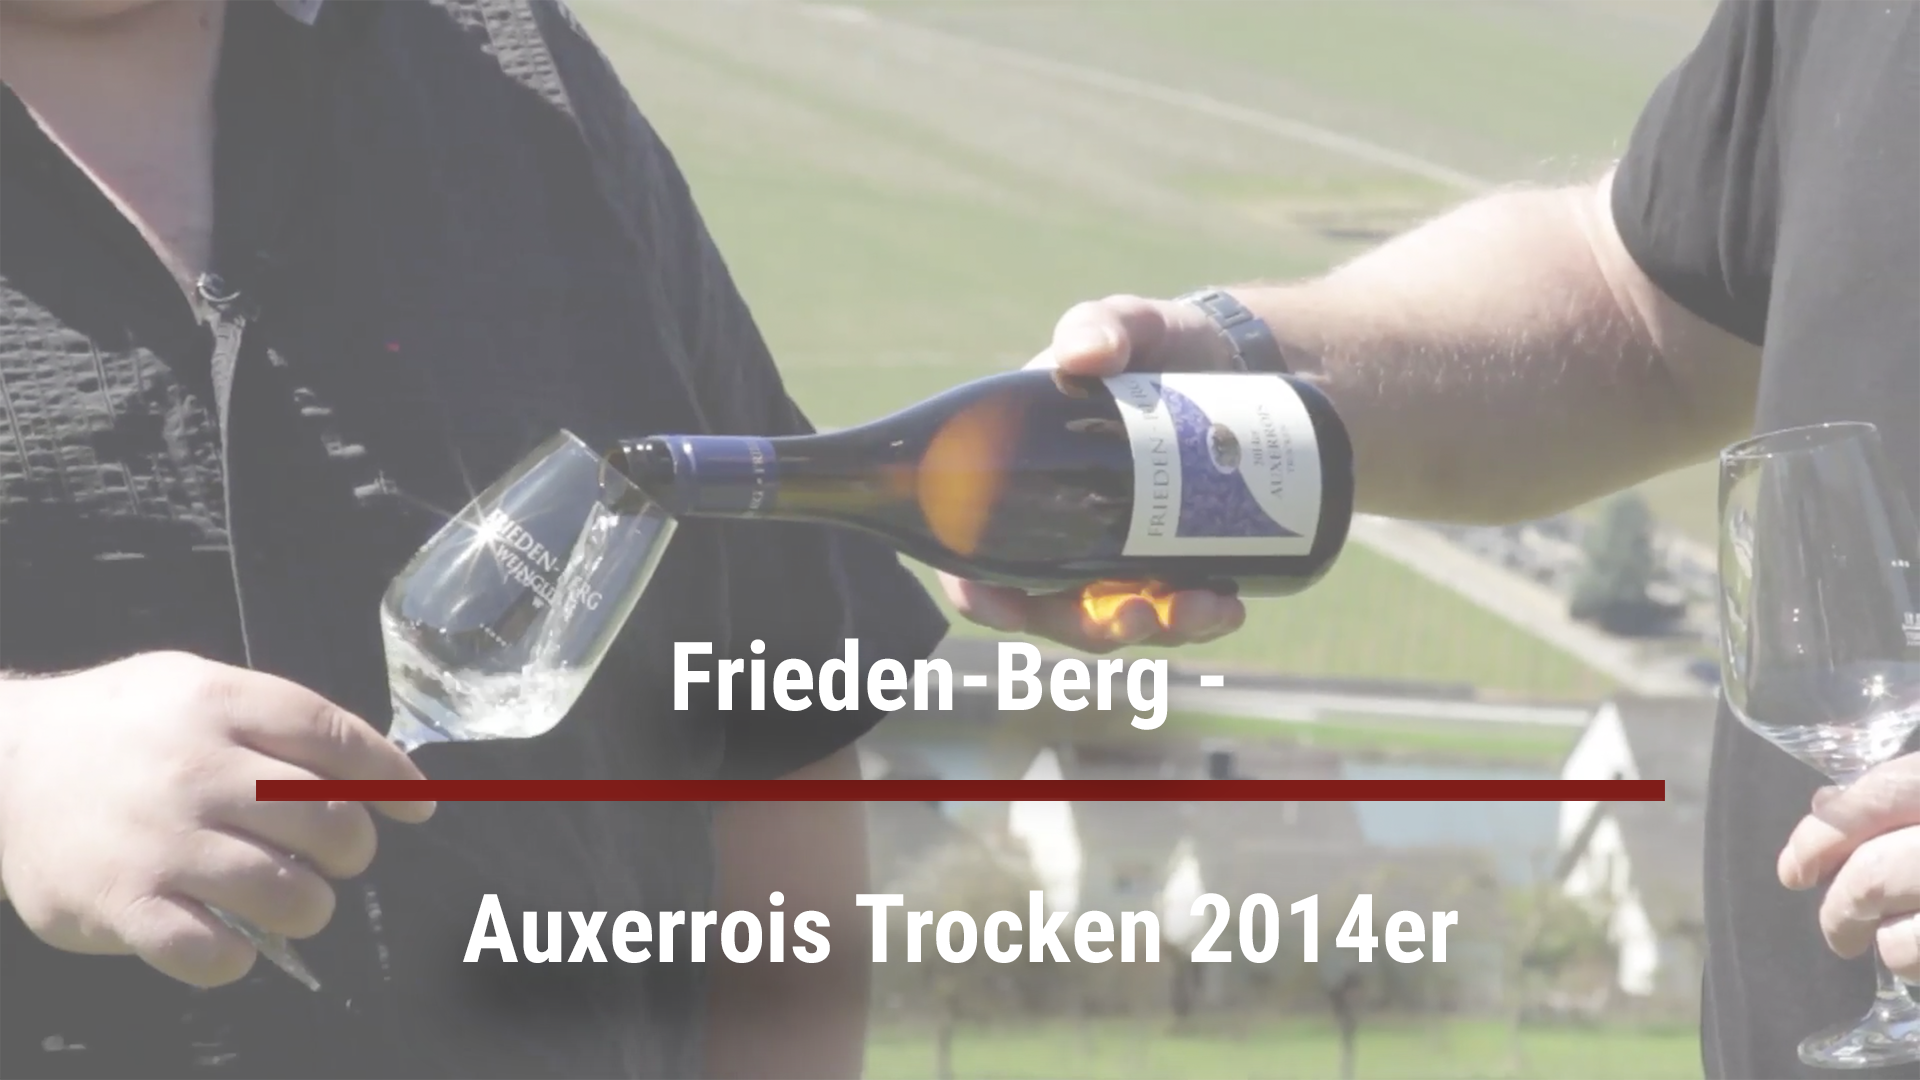 Frieden-Berg – Auxerrois Trocken 2014er